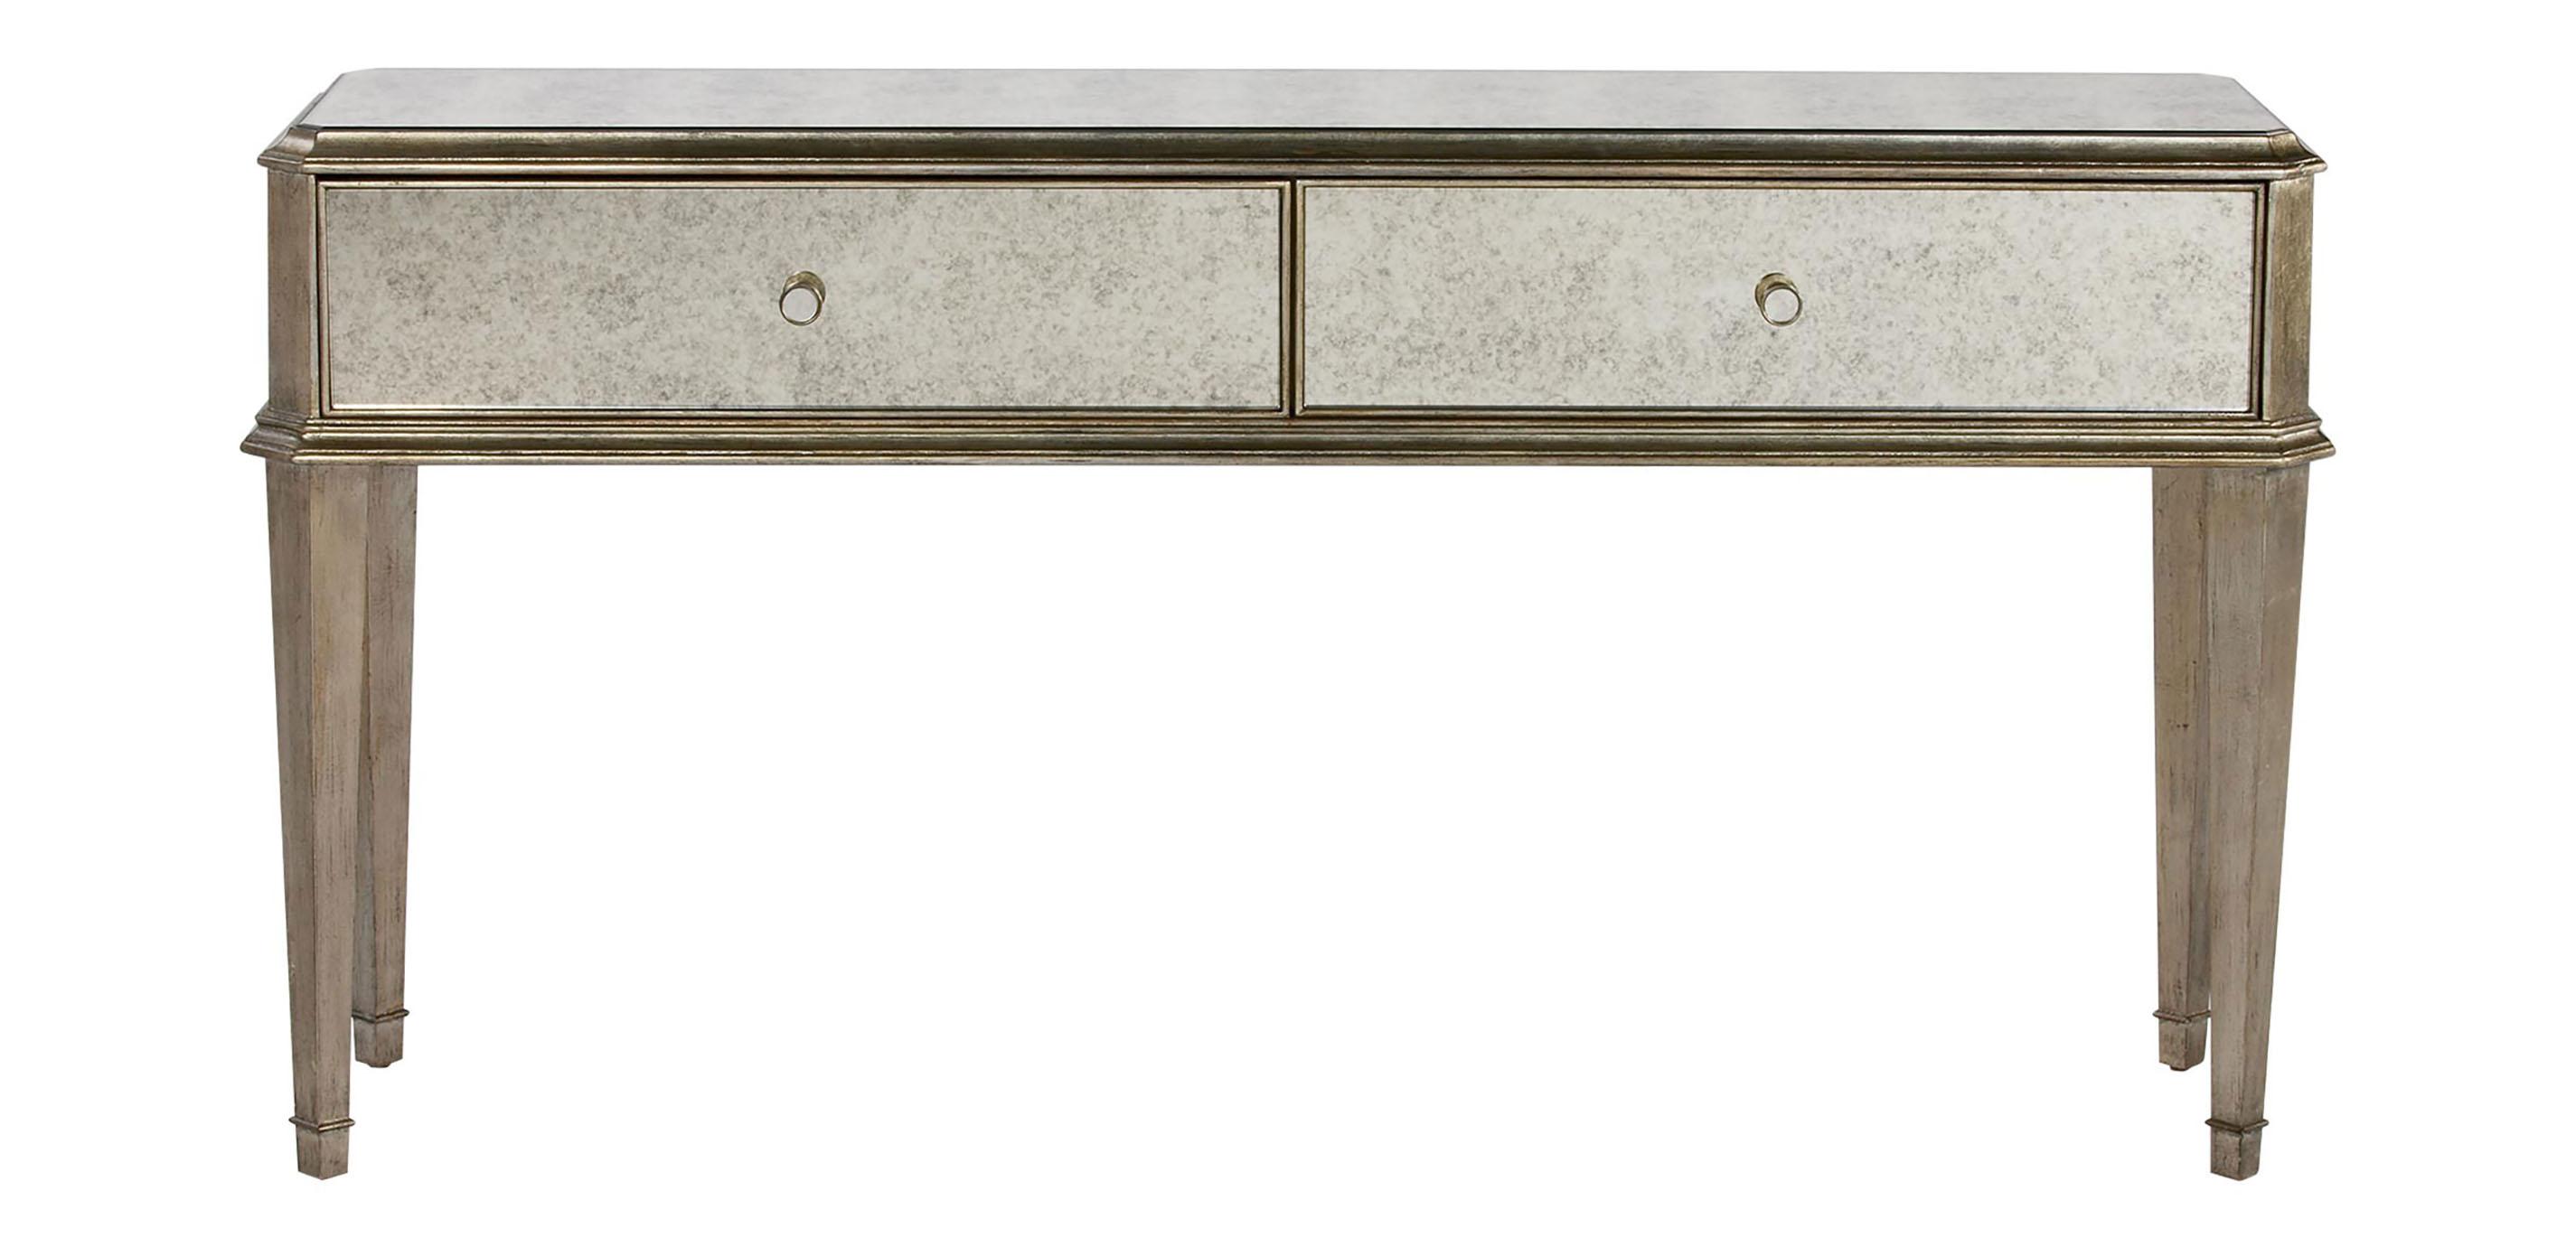 wonderful living room sofa table | Vivica Sofa Table | Console Tables